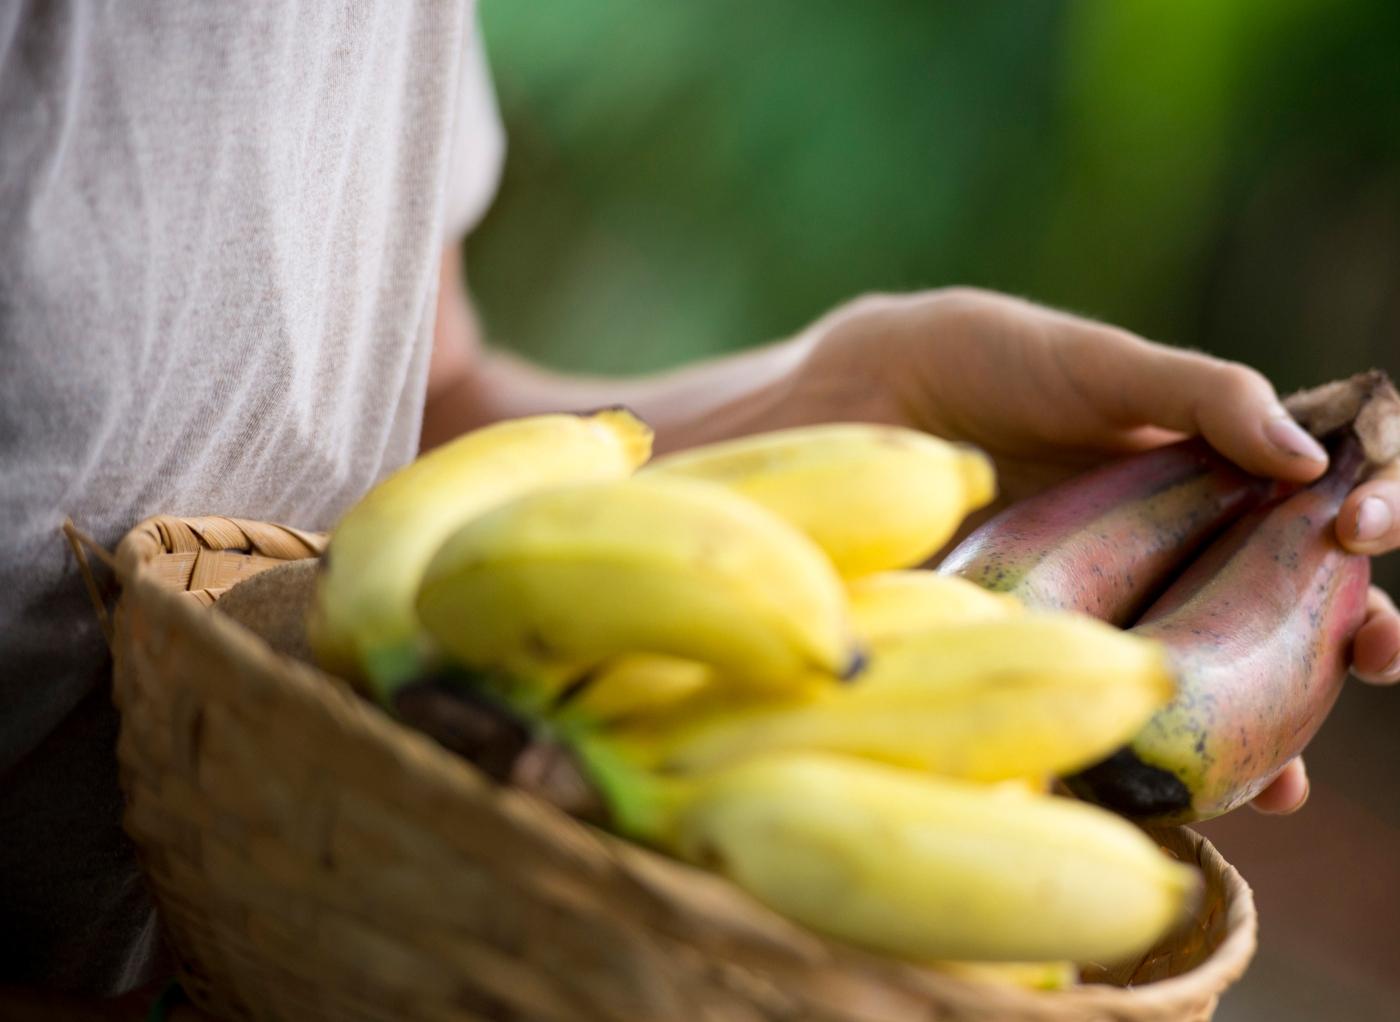 Diarreia: tentar comer mais banana